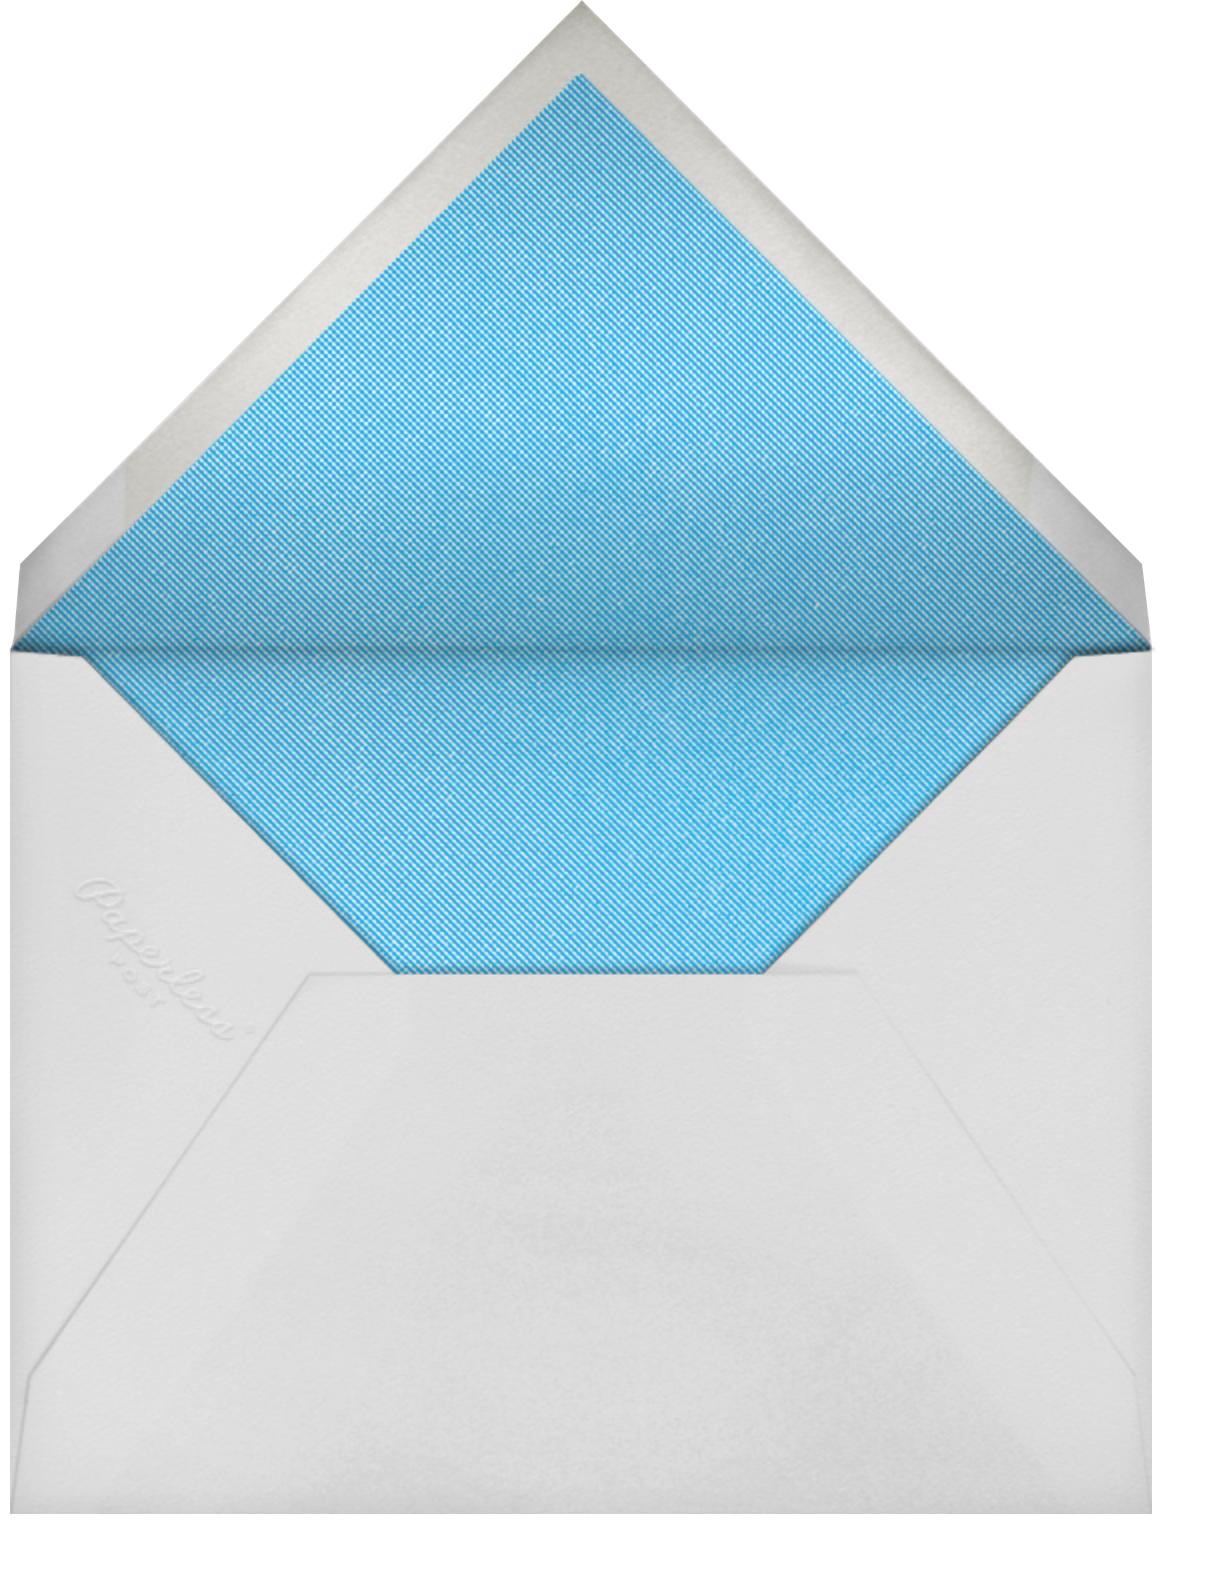 Kingpin - Paperless Post - Adult birthday - envelope back